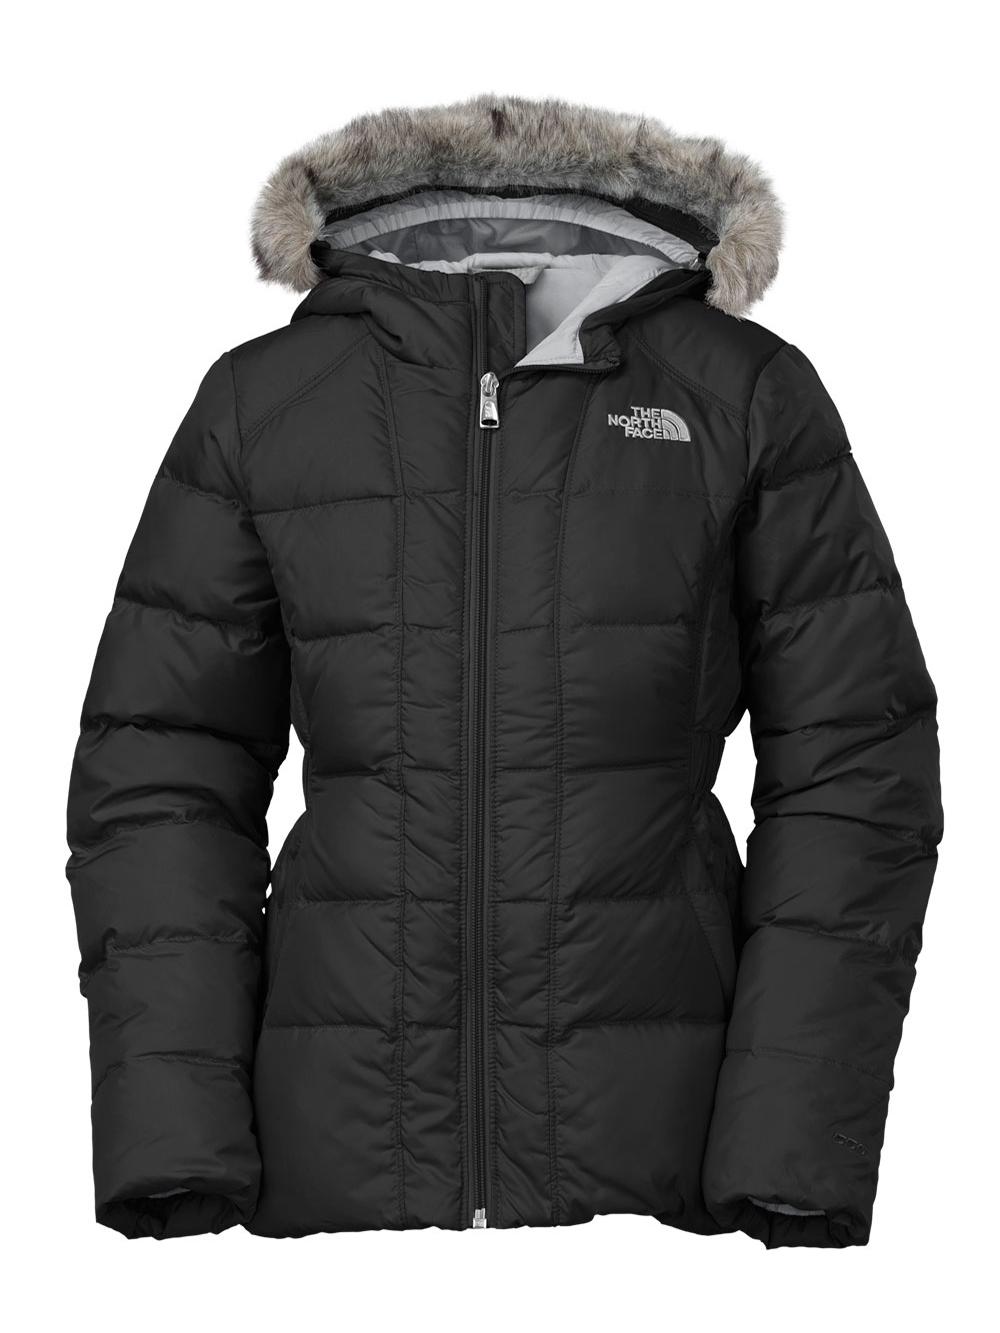 The North Face Big Girls' Gotham Jacket (Sizes 7S - 20XL)